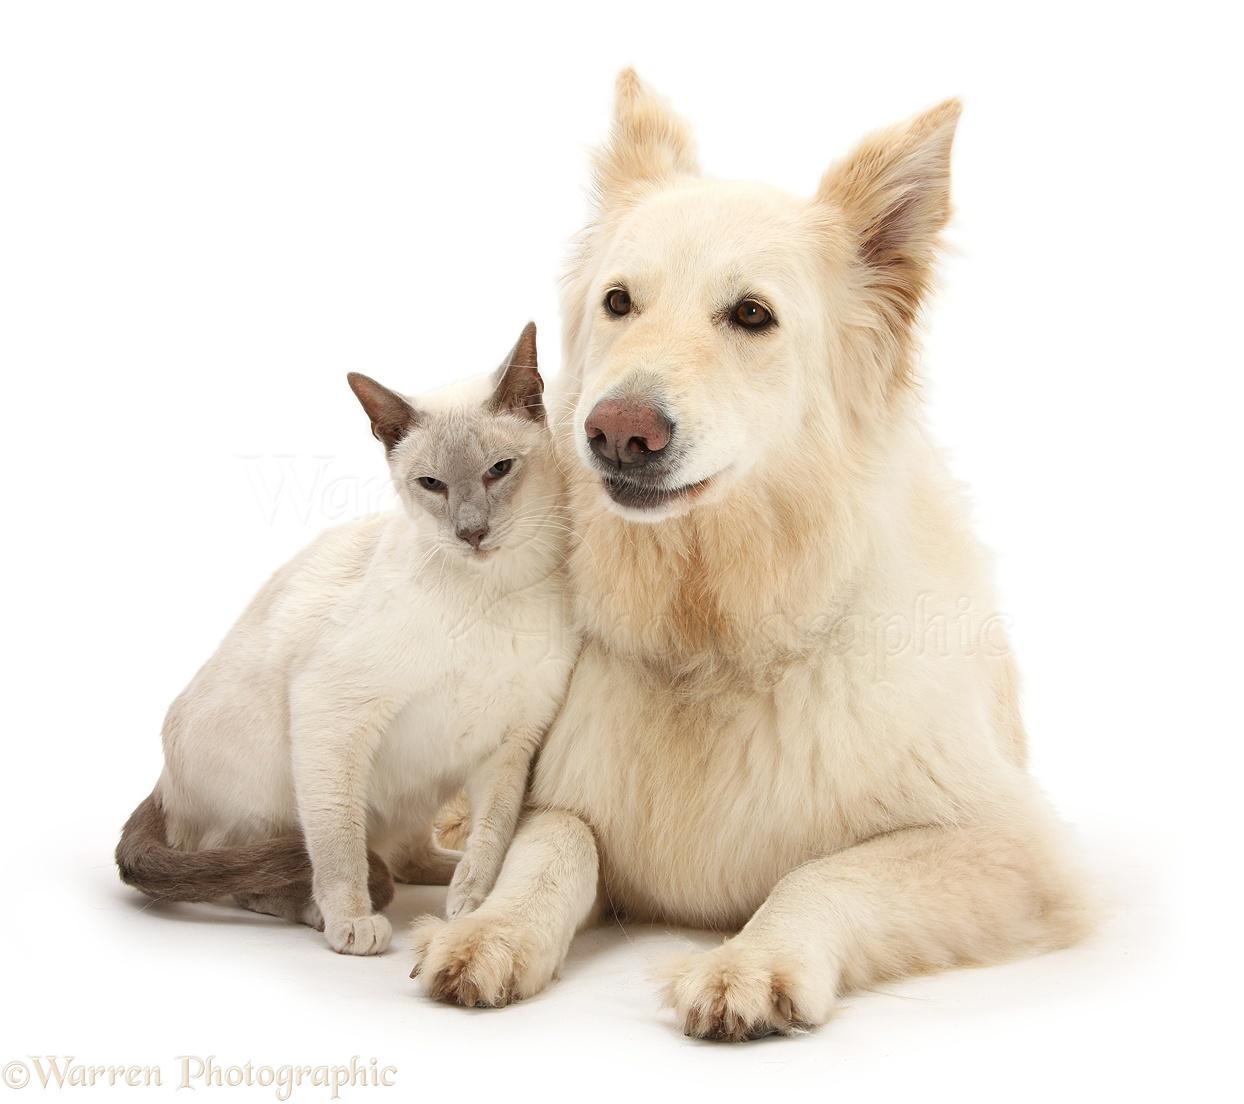 The Dog Cat